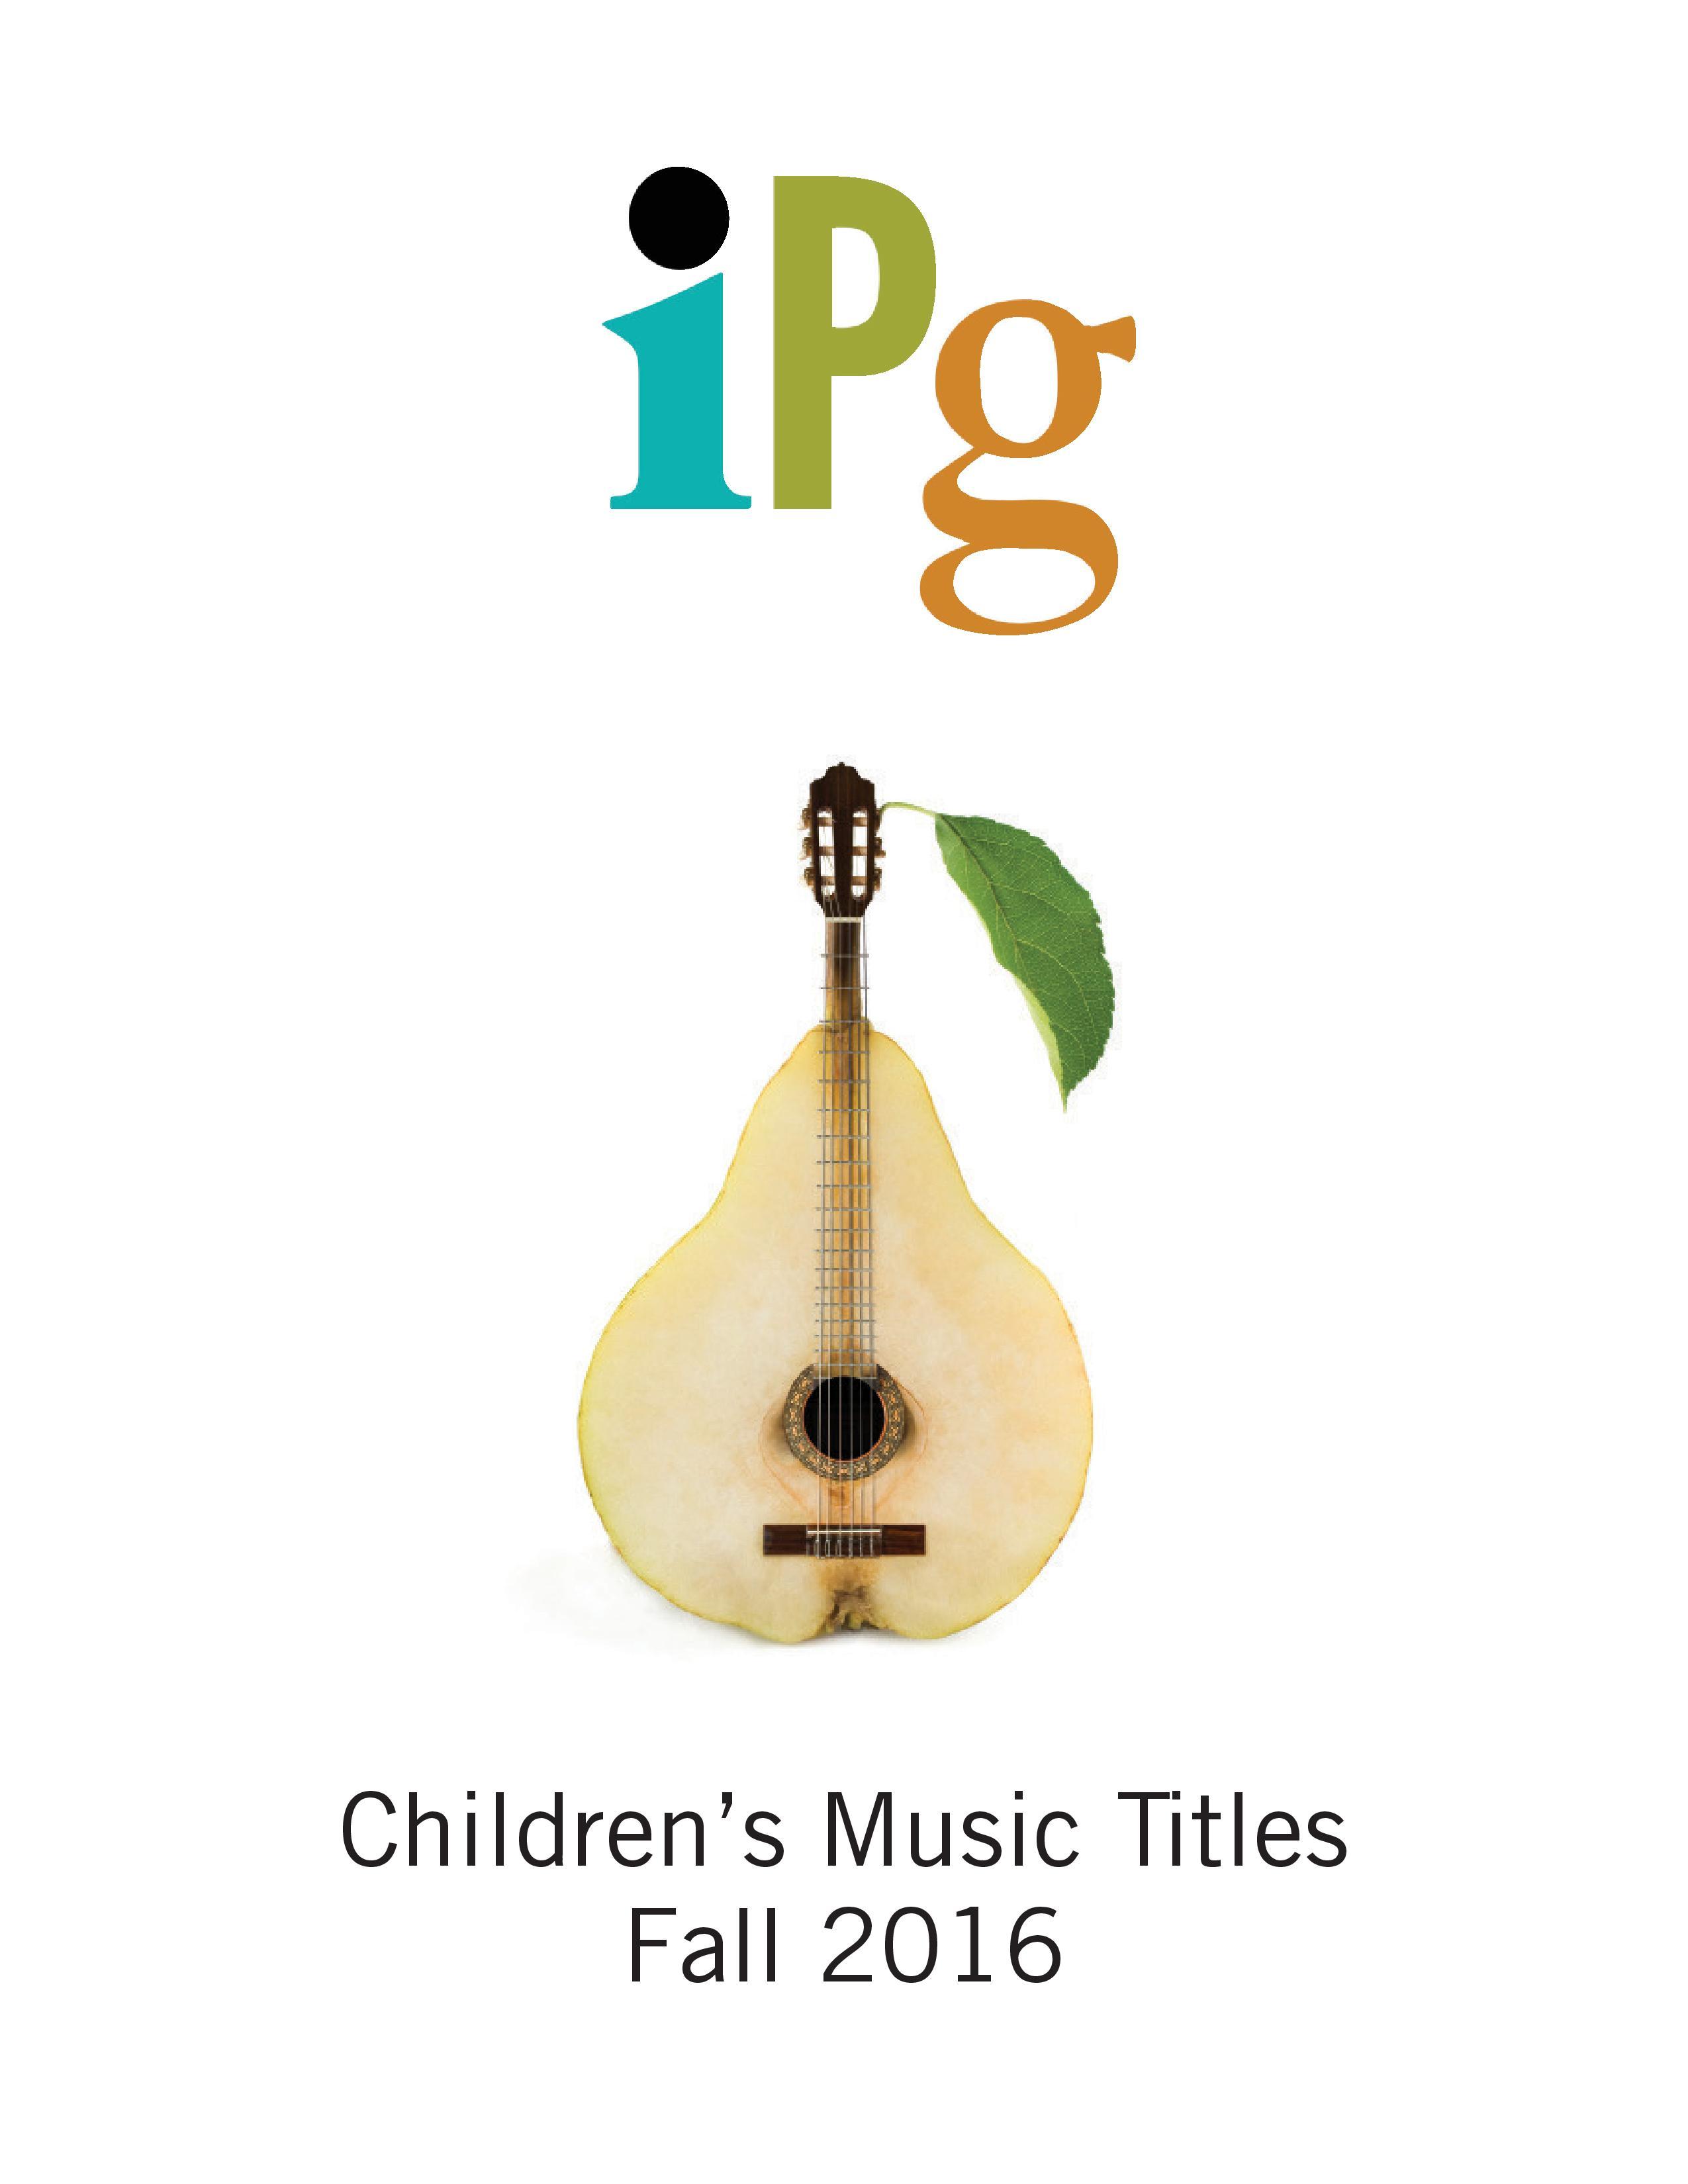 Children's Music Titles